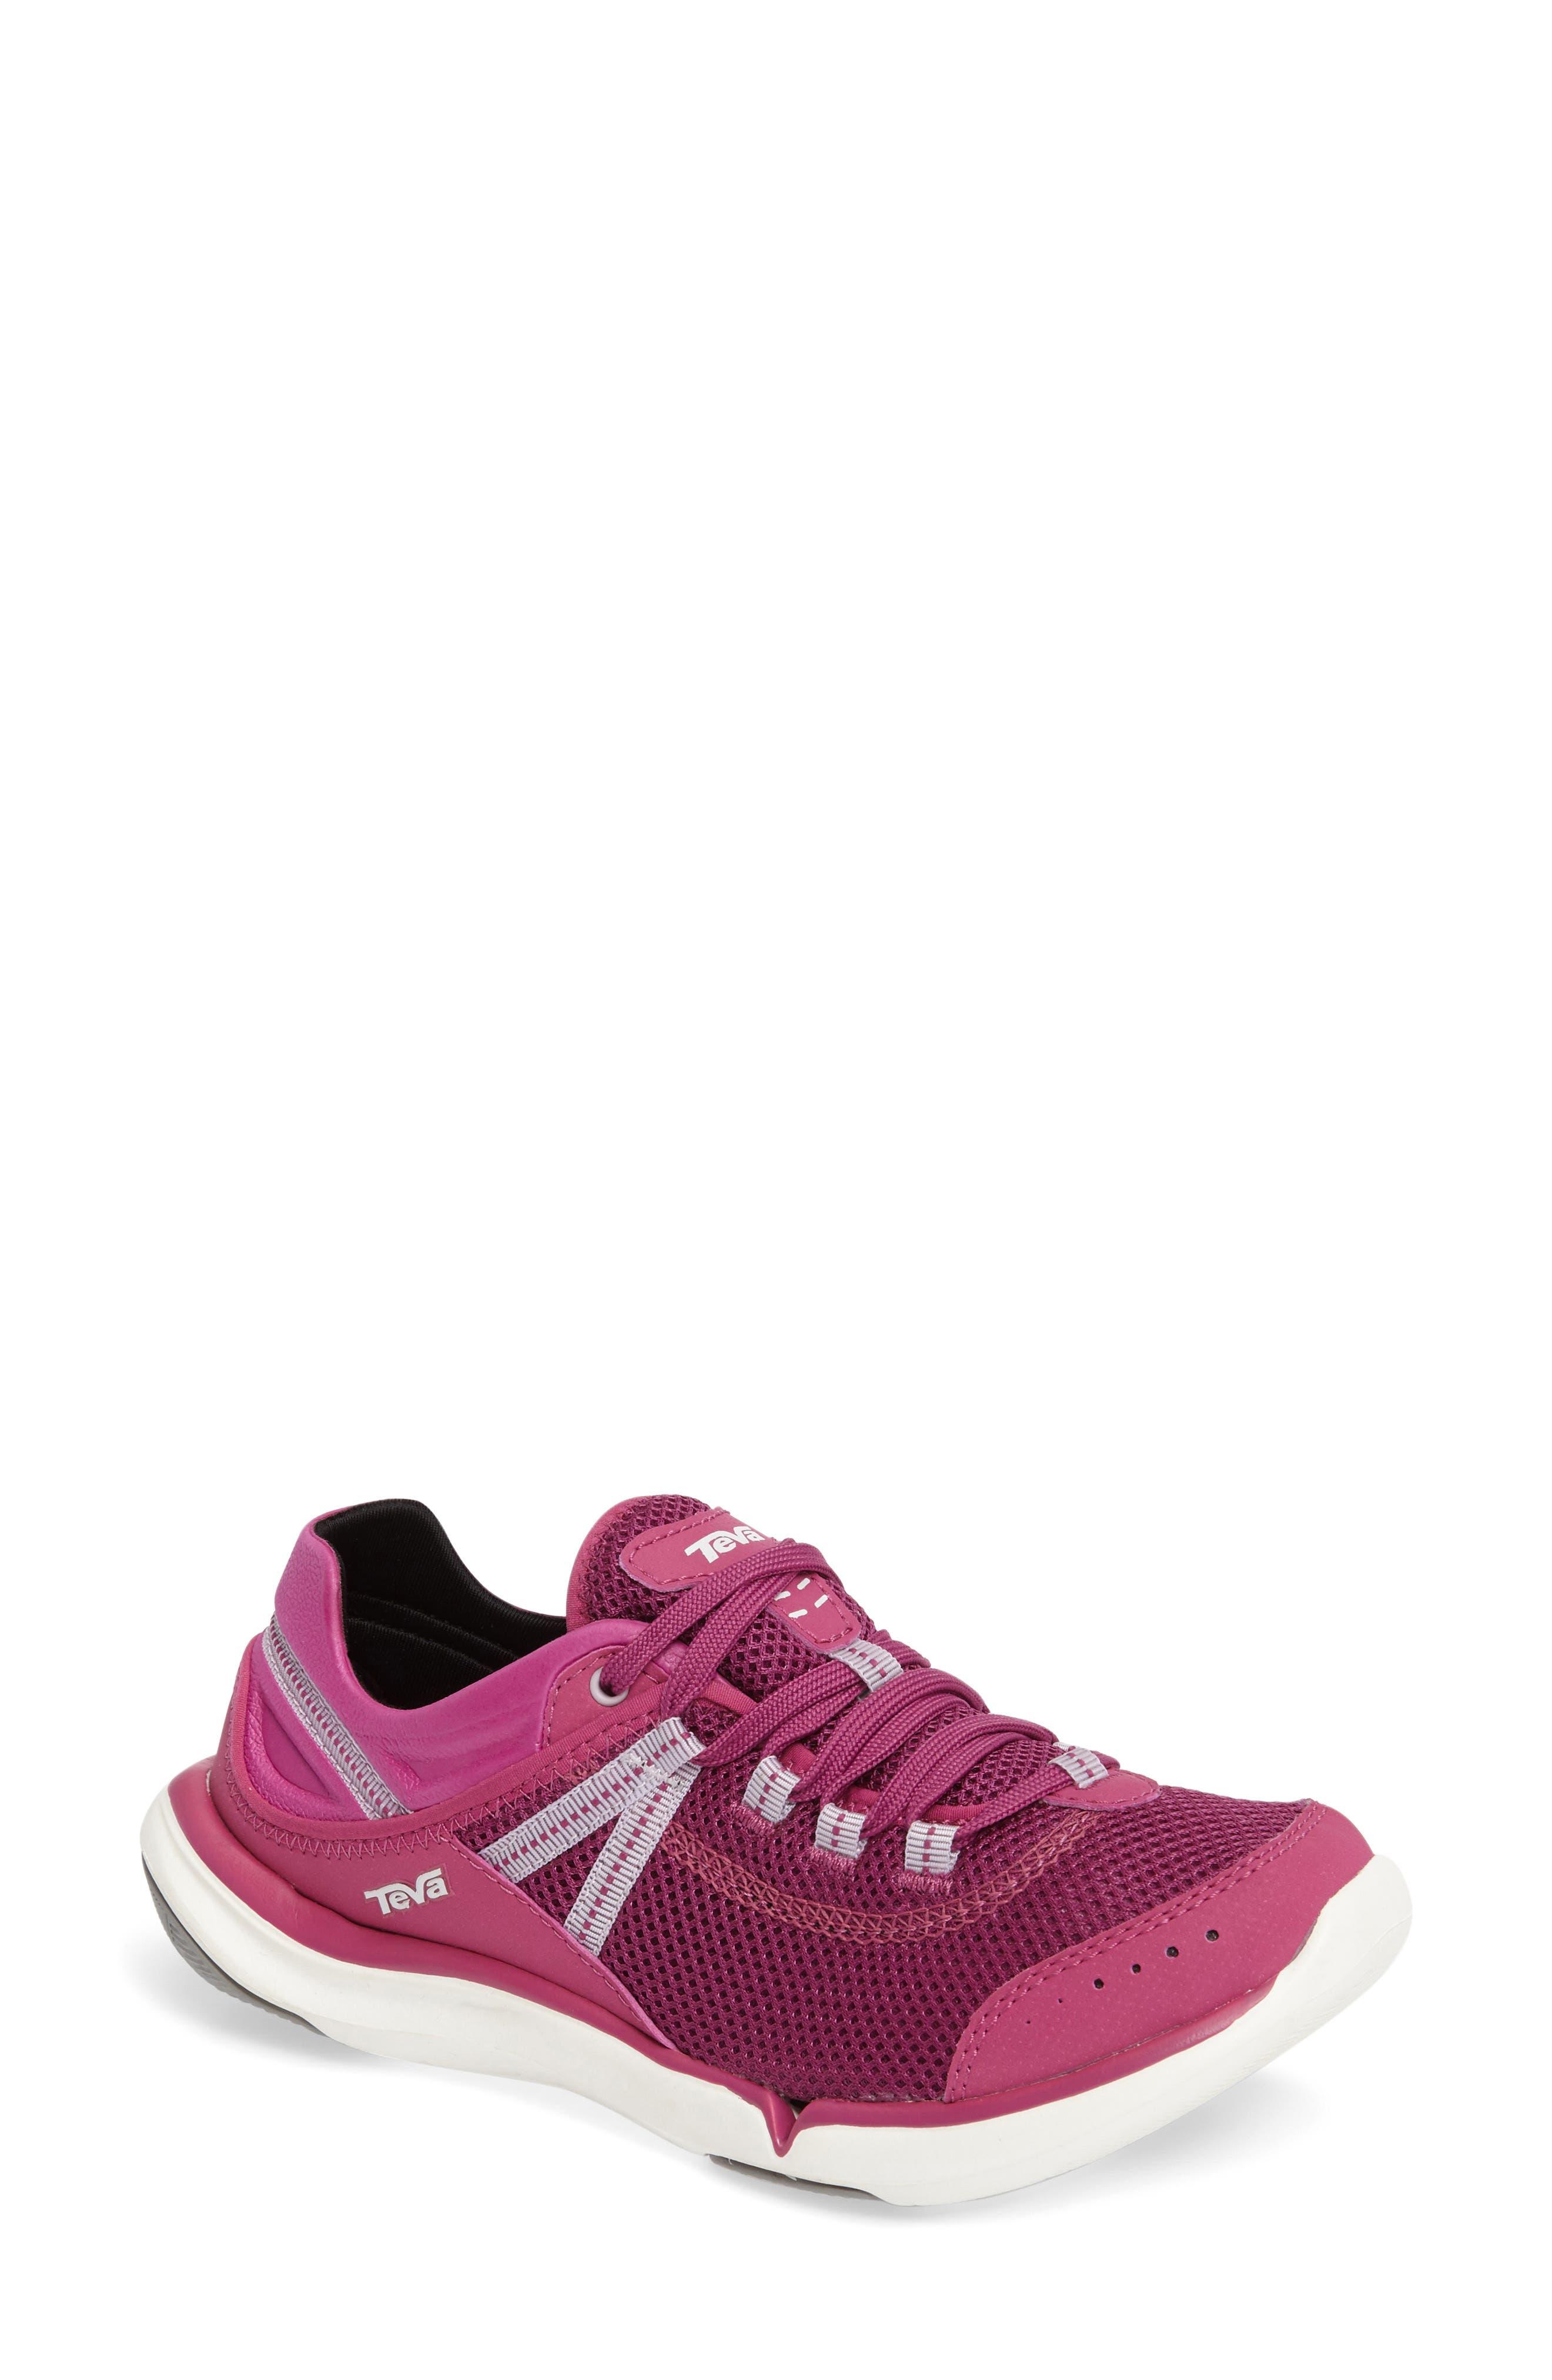 Teva Evo Sneaker (Women)